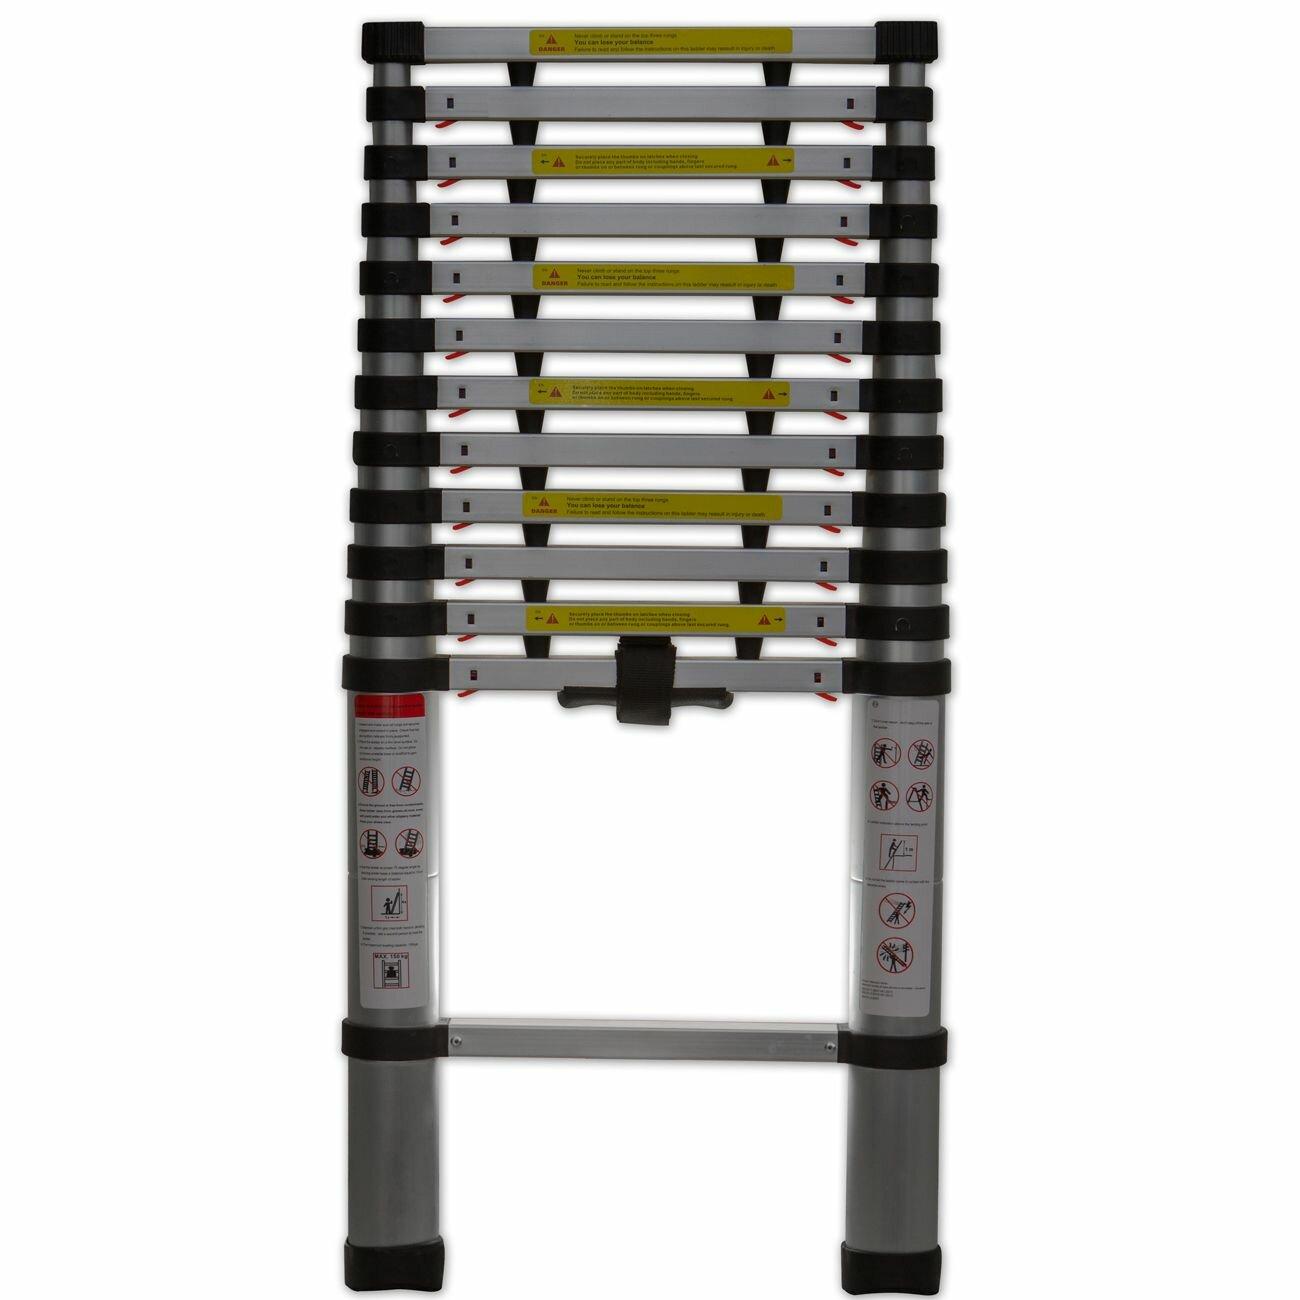 Extend Ladder 12 5 : Oxgord ft aluminum telescoping extension ladder with